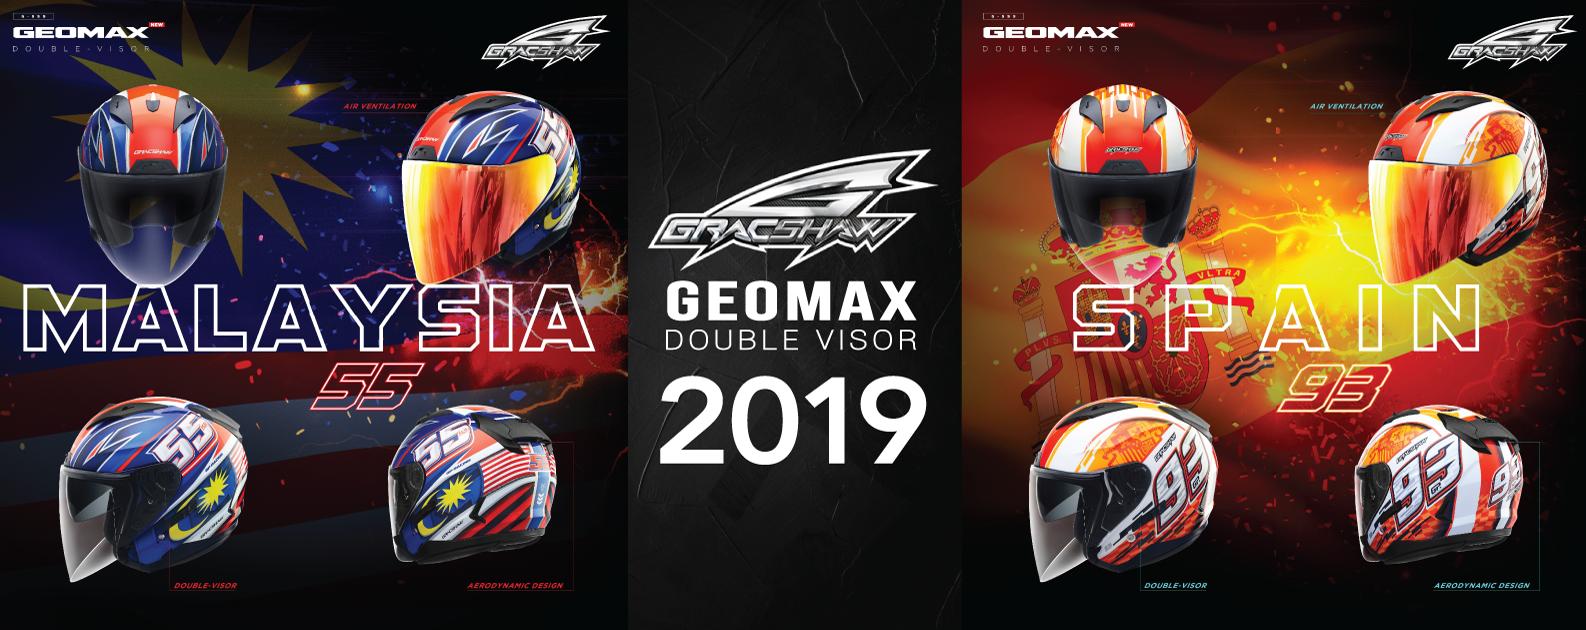 Gracshaw Geomax